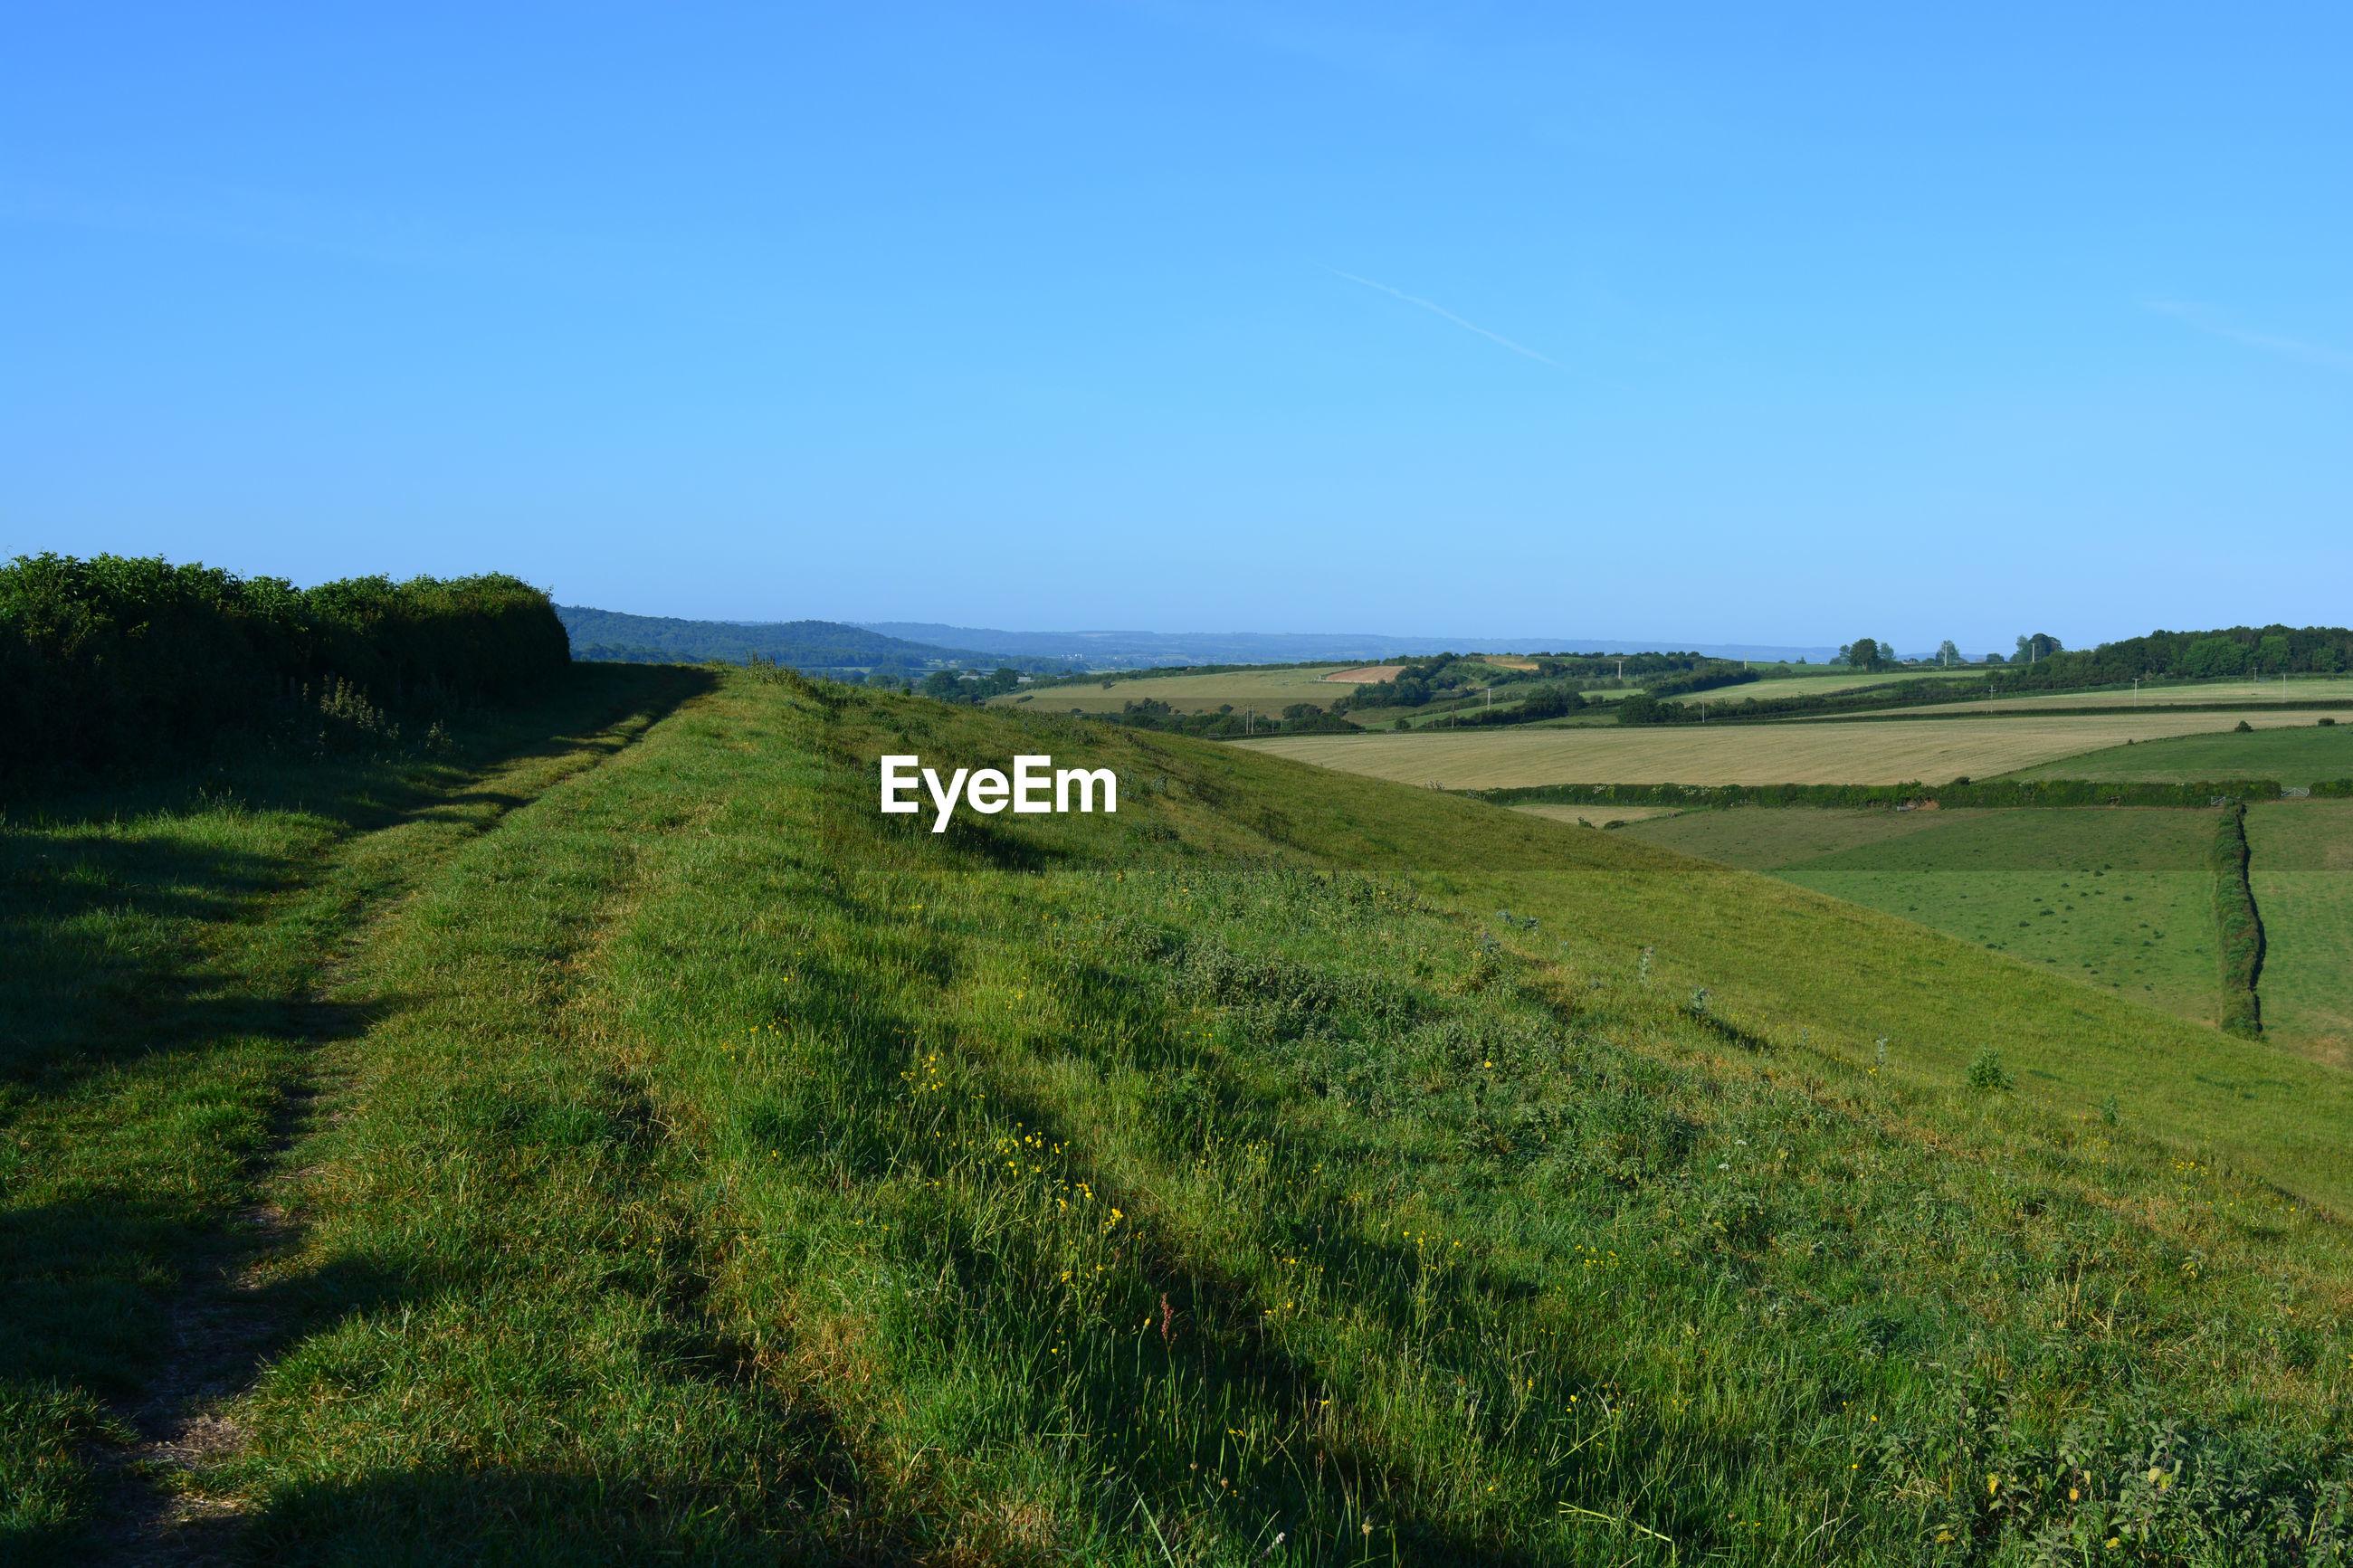 Landscape view from donkey lane track between oborne and poyntington, sherborne, dorset, england